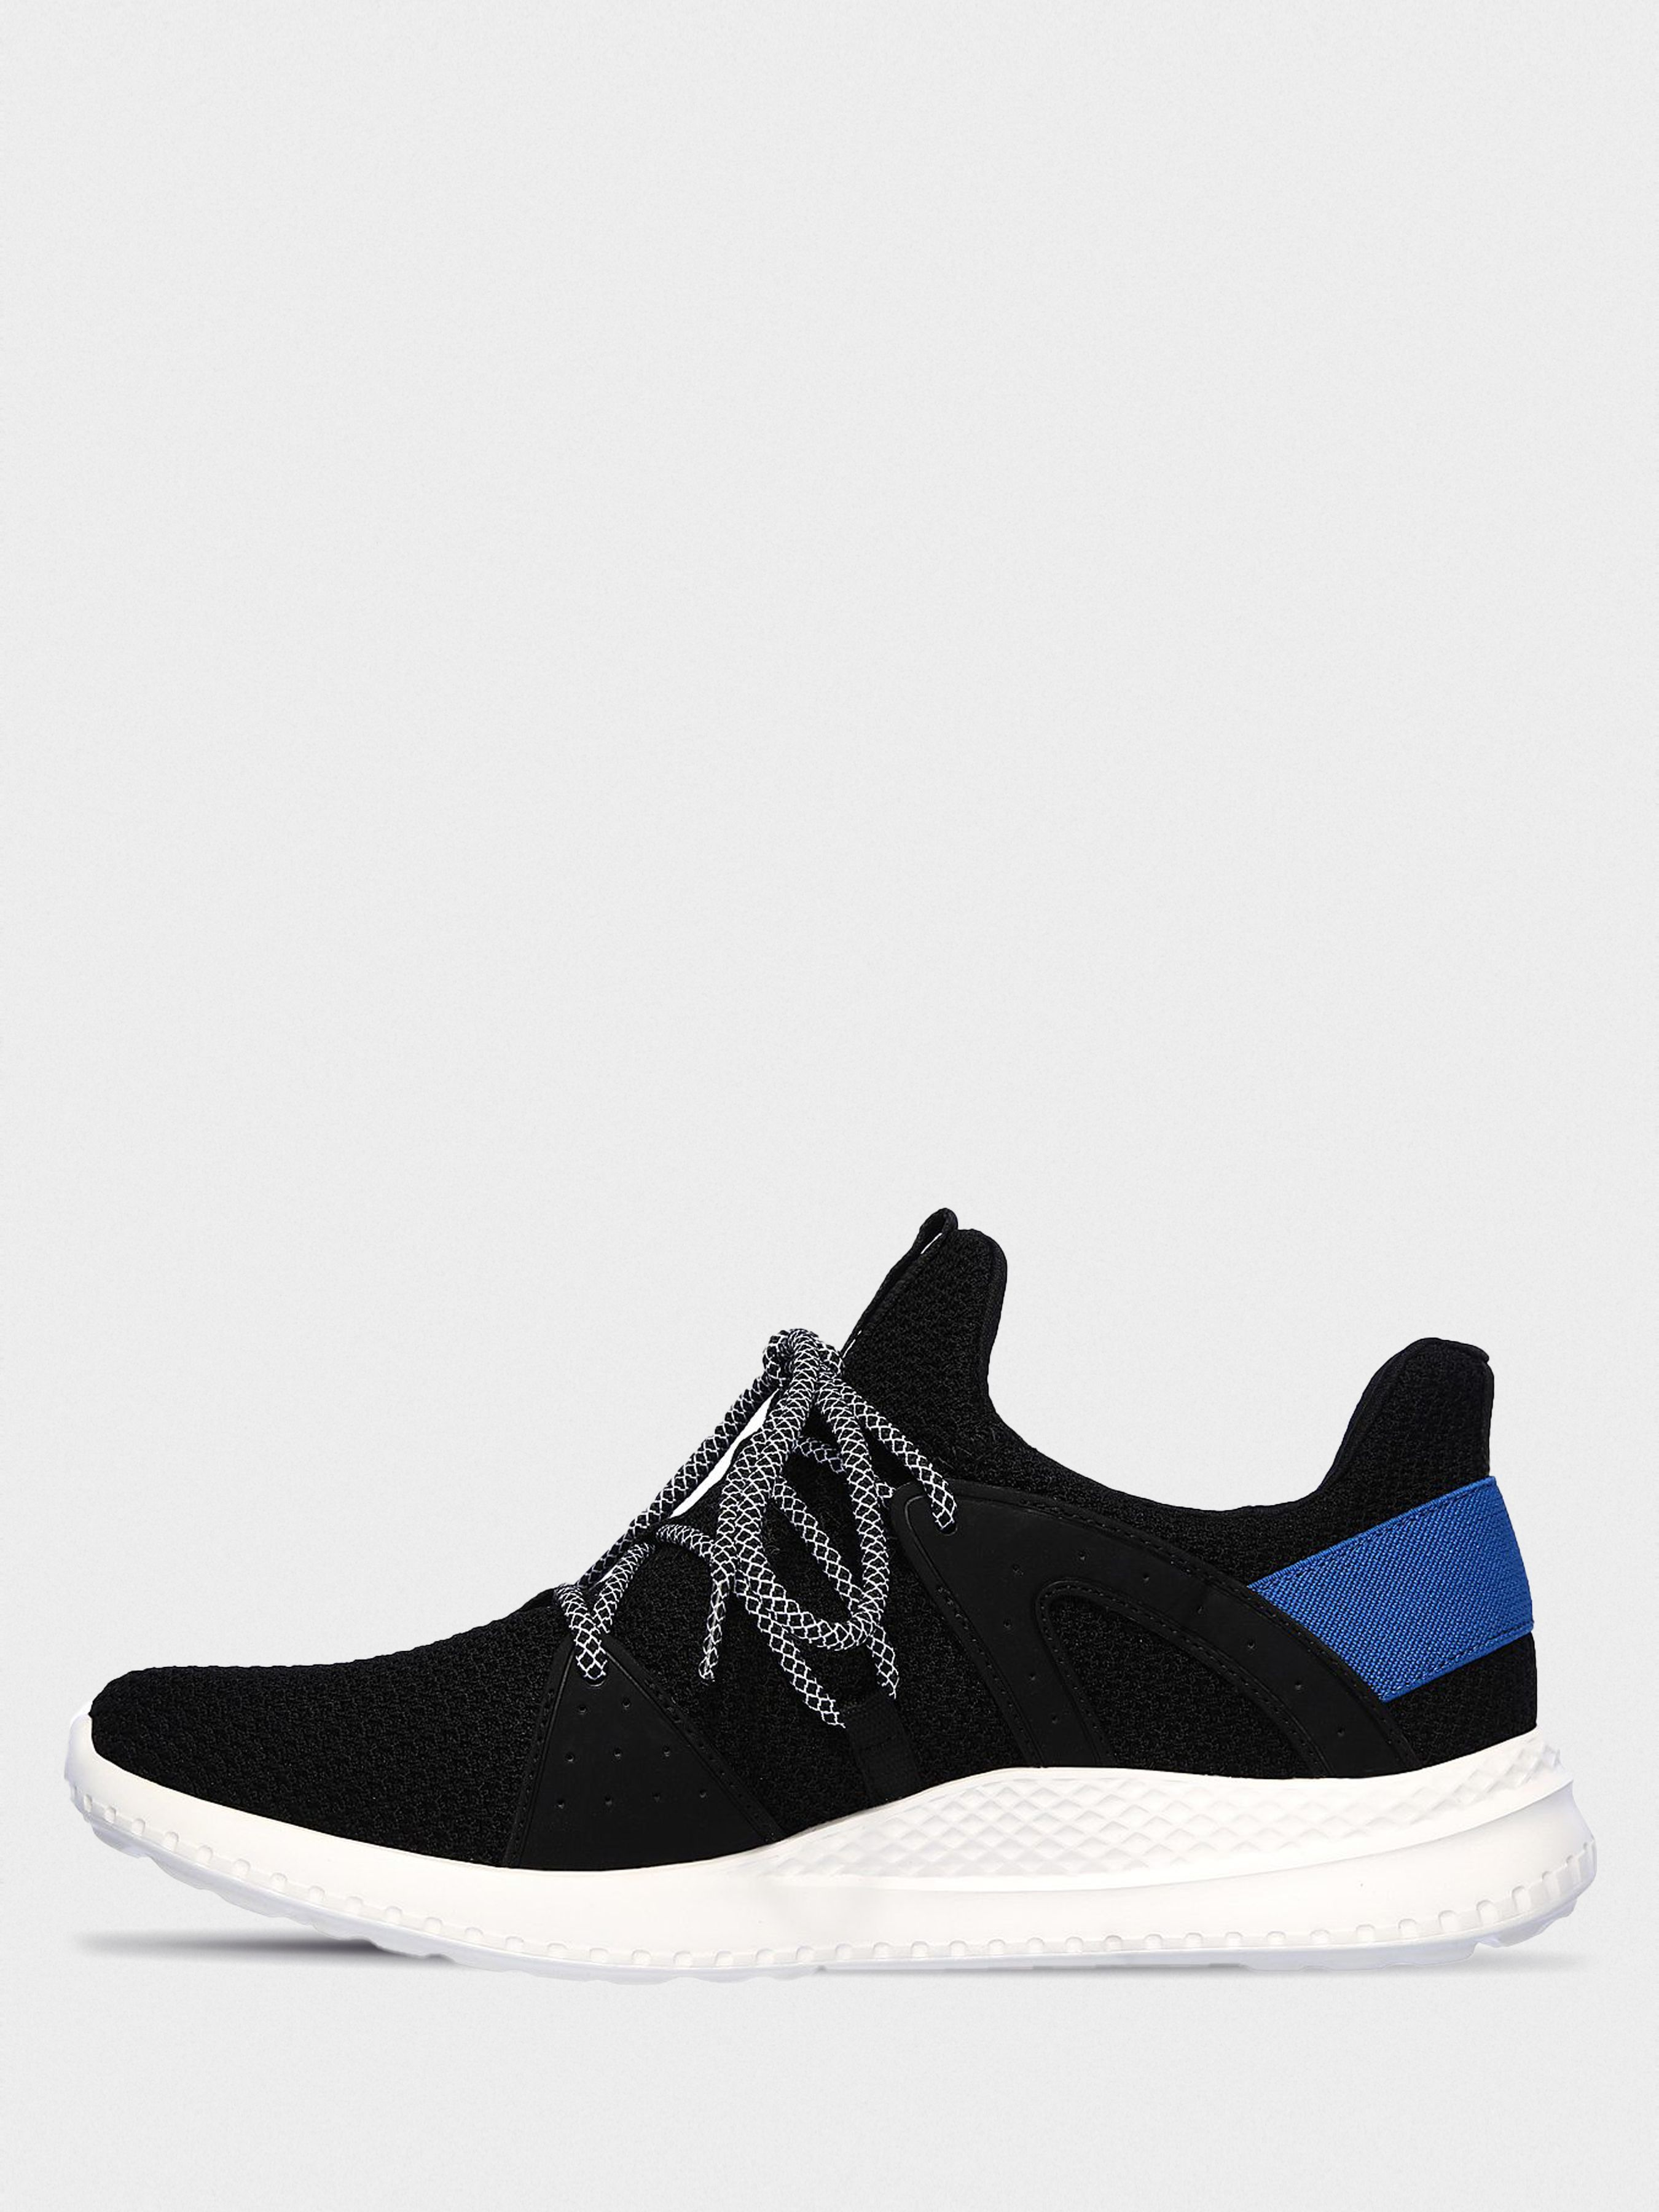 Кросівки для міста Skechers Matera 51865 BKW